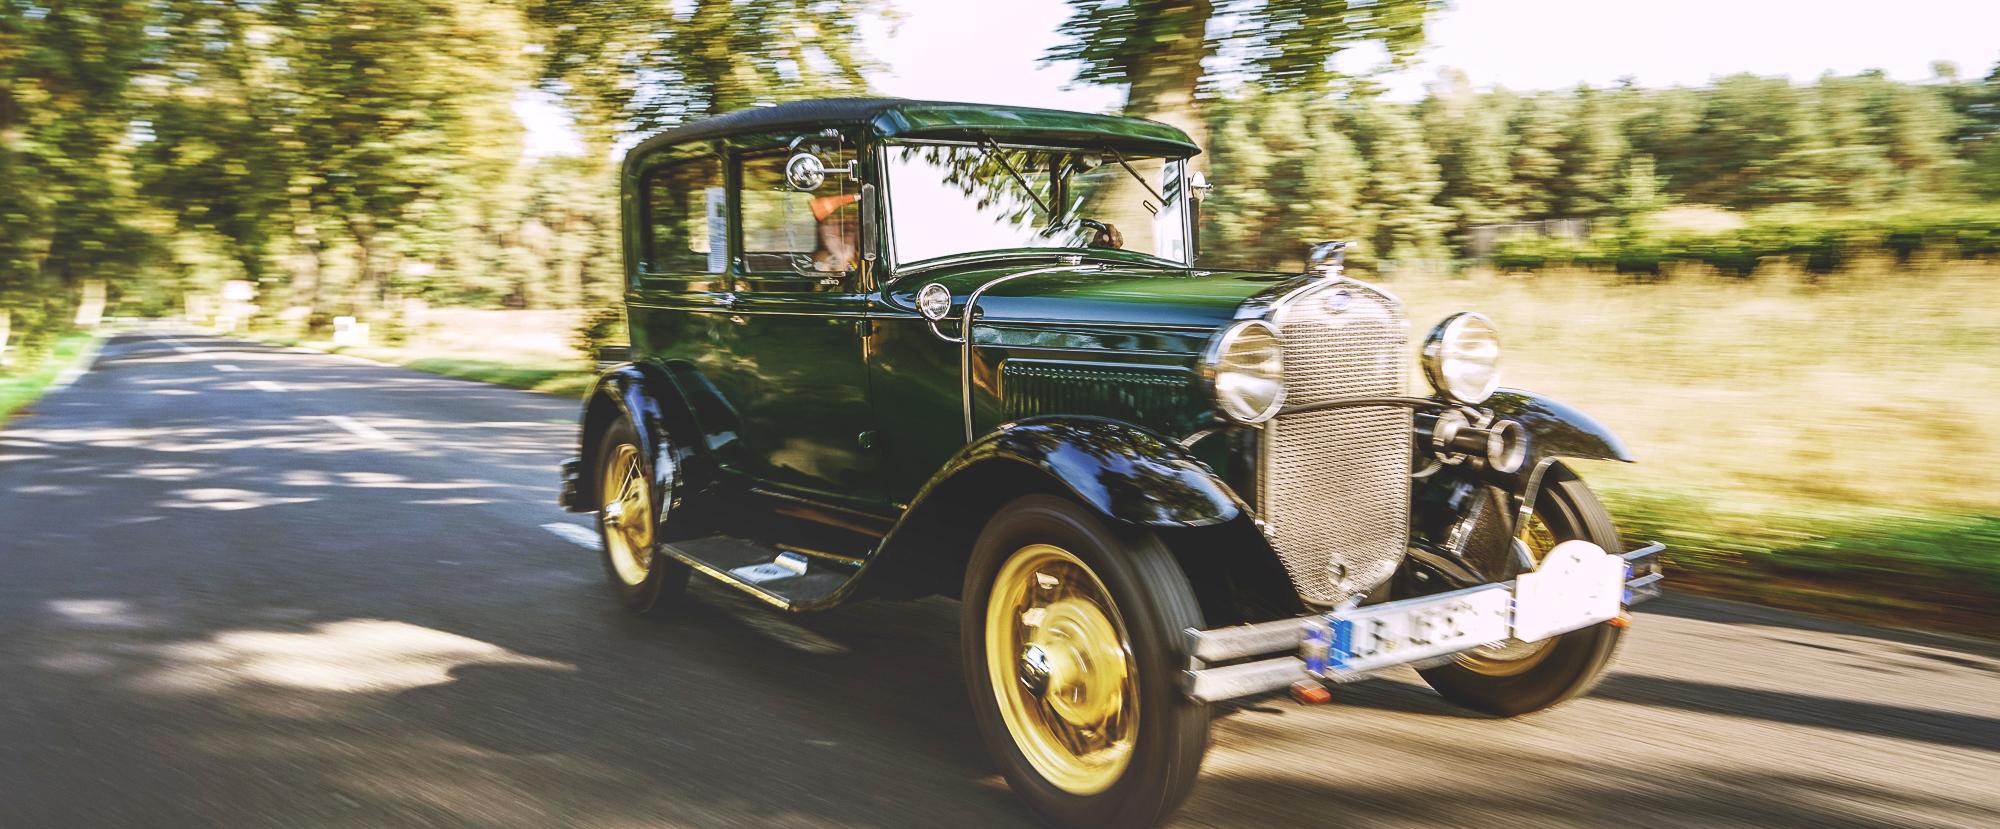 ADAC Landpartie - A Vintage Car Weekend - Wheels of Stil by Sven ...